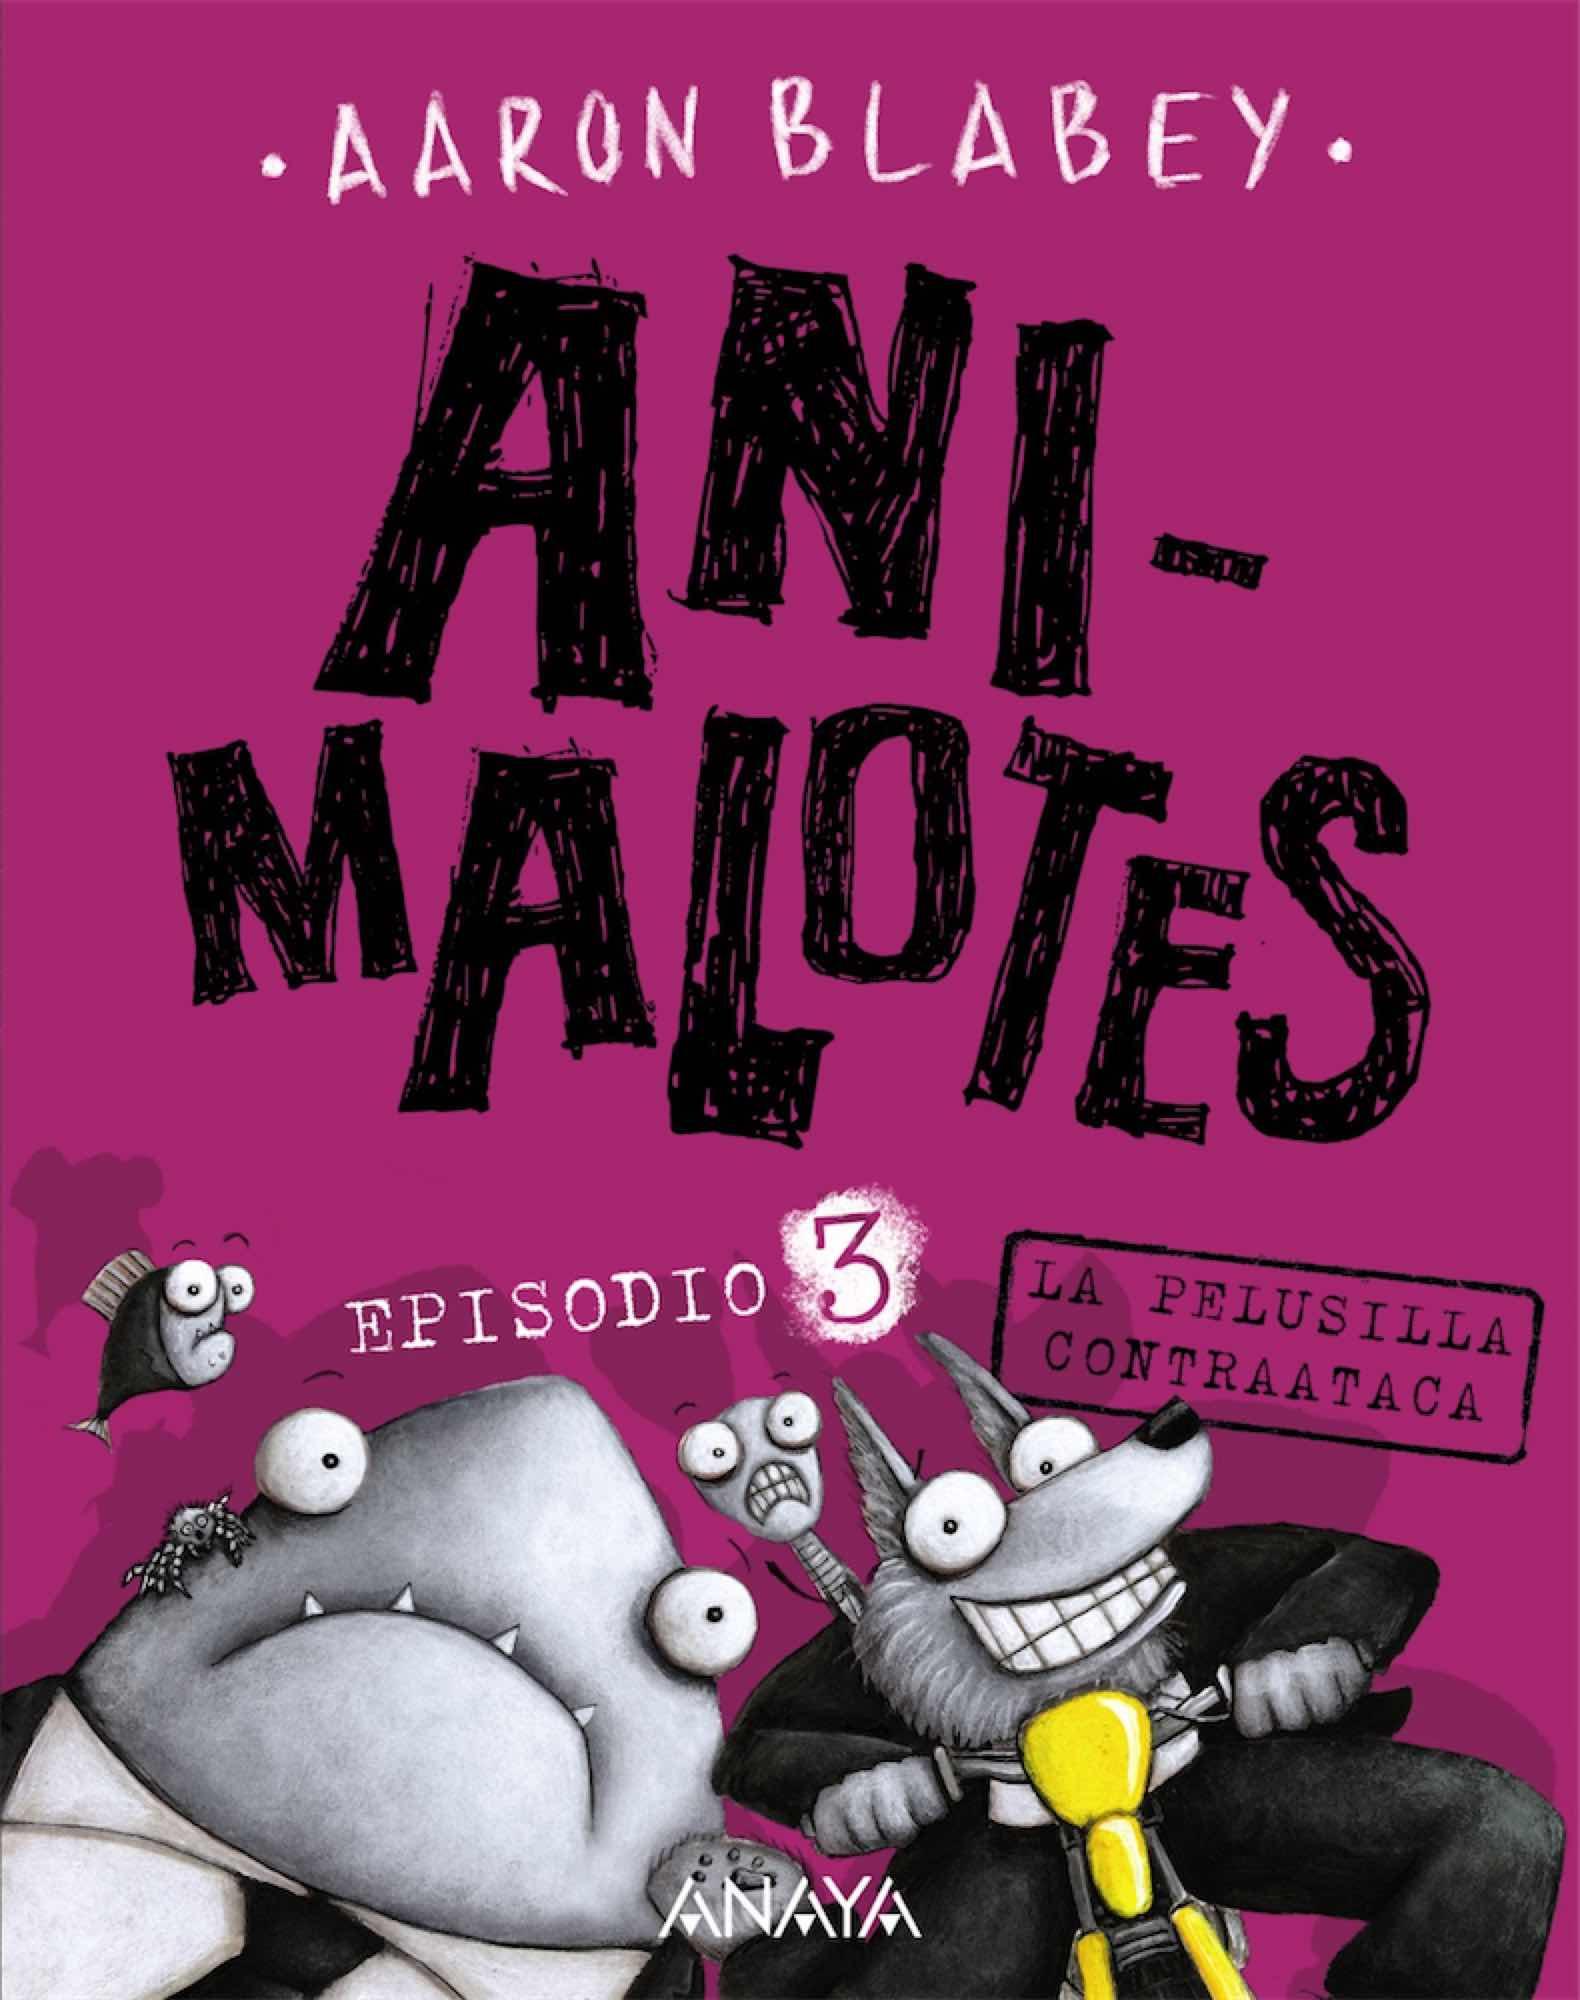 ANI-MALOTES 03. LA PELUSILLA CONTRAATACA